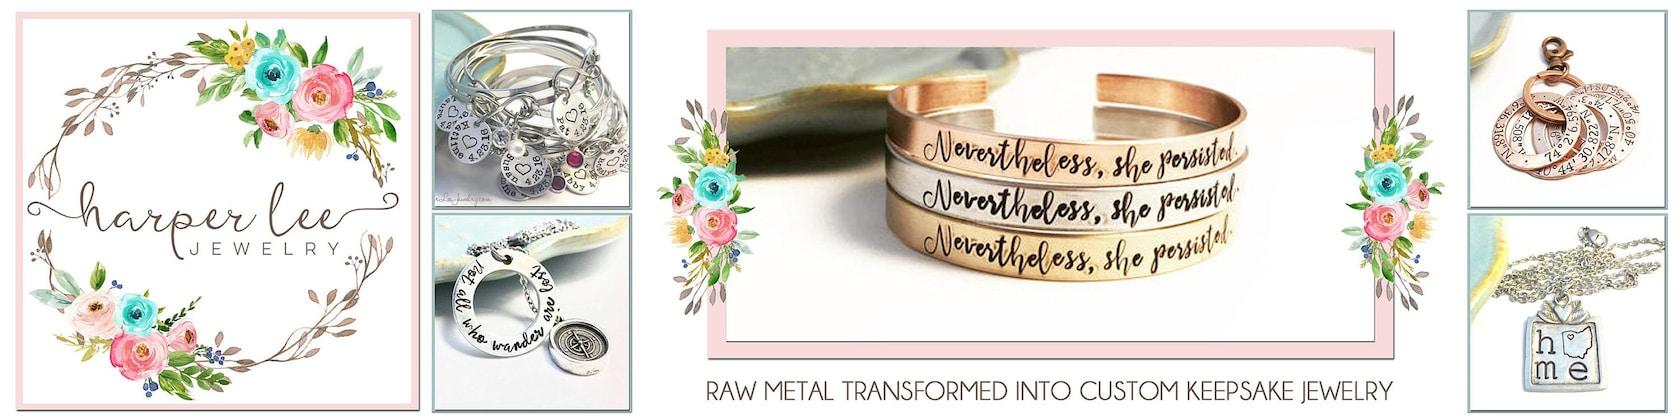 4f749c7b3 HarperLeeJewelry. Raw Metal Transformed into Custom Keepsake Jewelry!